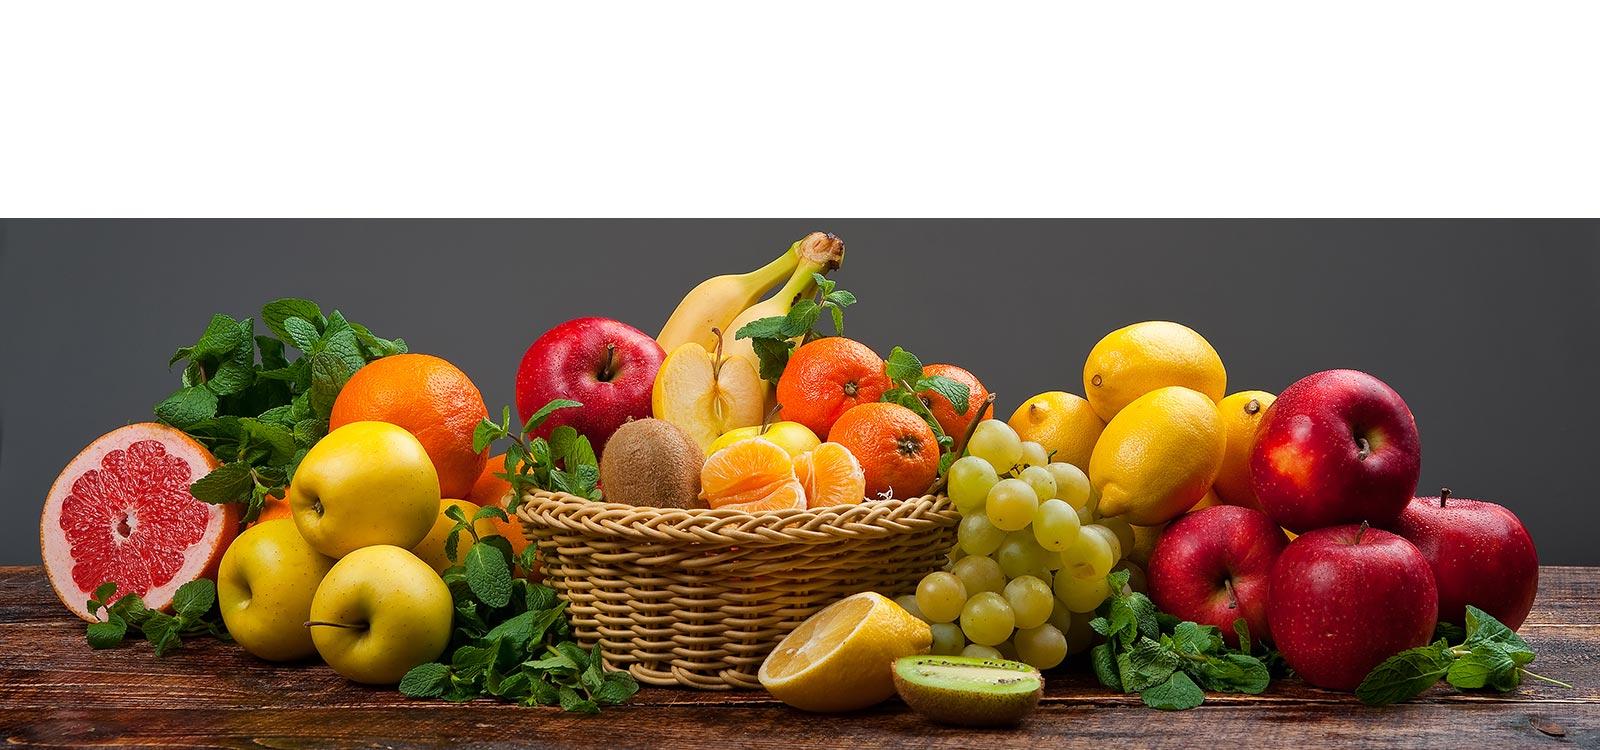 Alfa Catering - Μεγάλη ποικιλία από φρούτα και λαχανικά από την Ελλάδα και όλο τον κόσμο